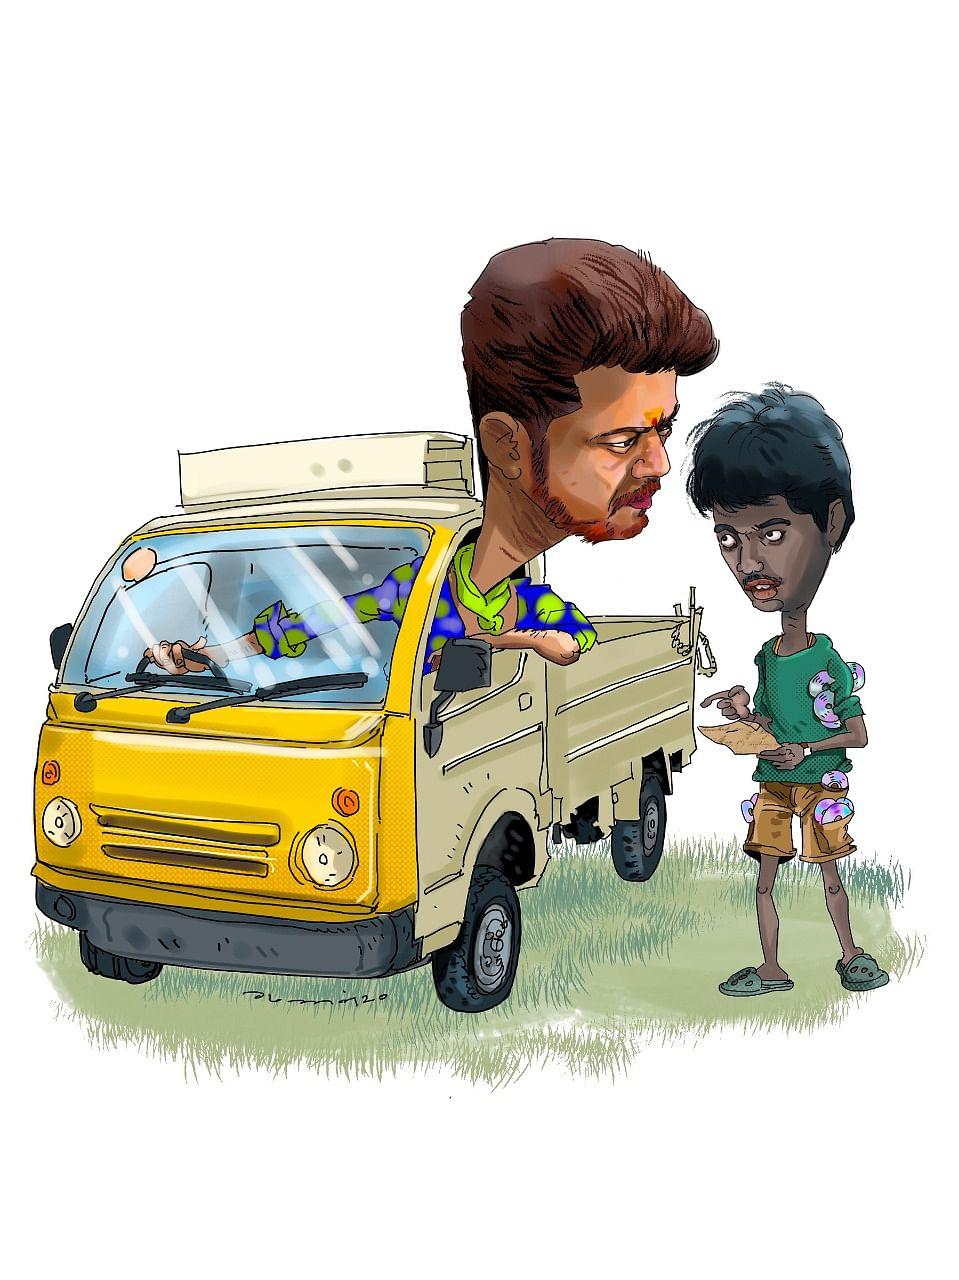 CM குமார் கூட்டணி வித் குருவில்லா